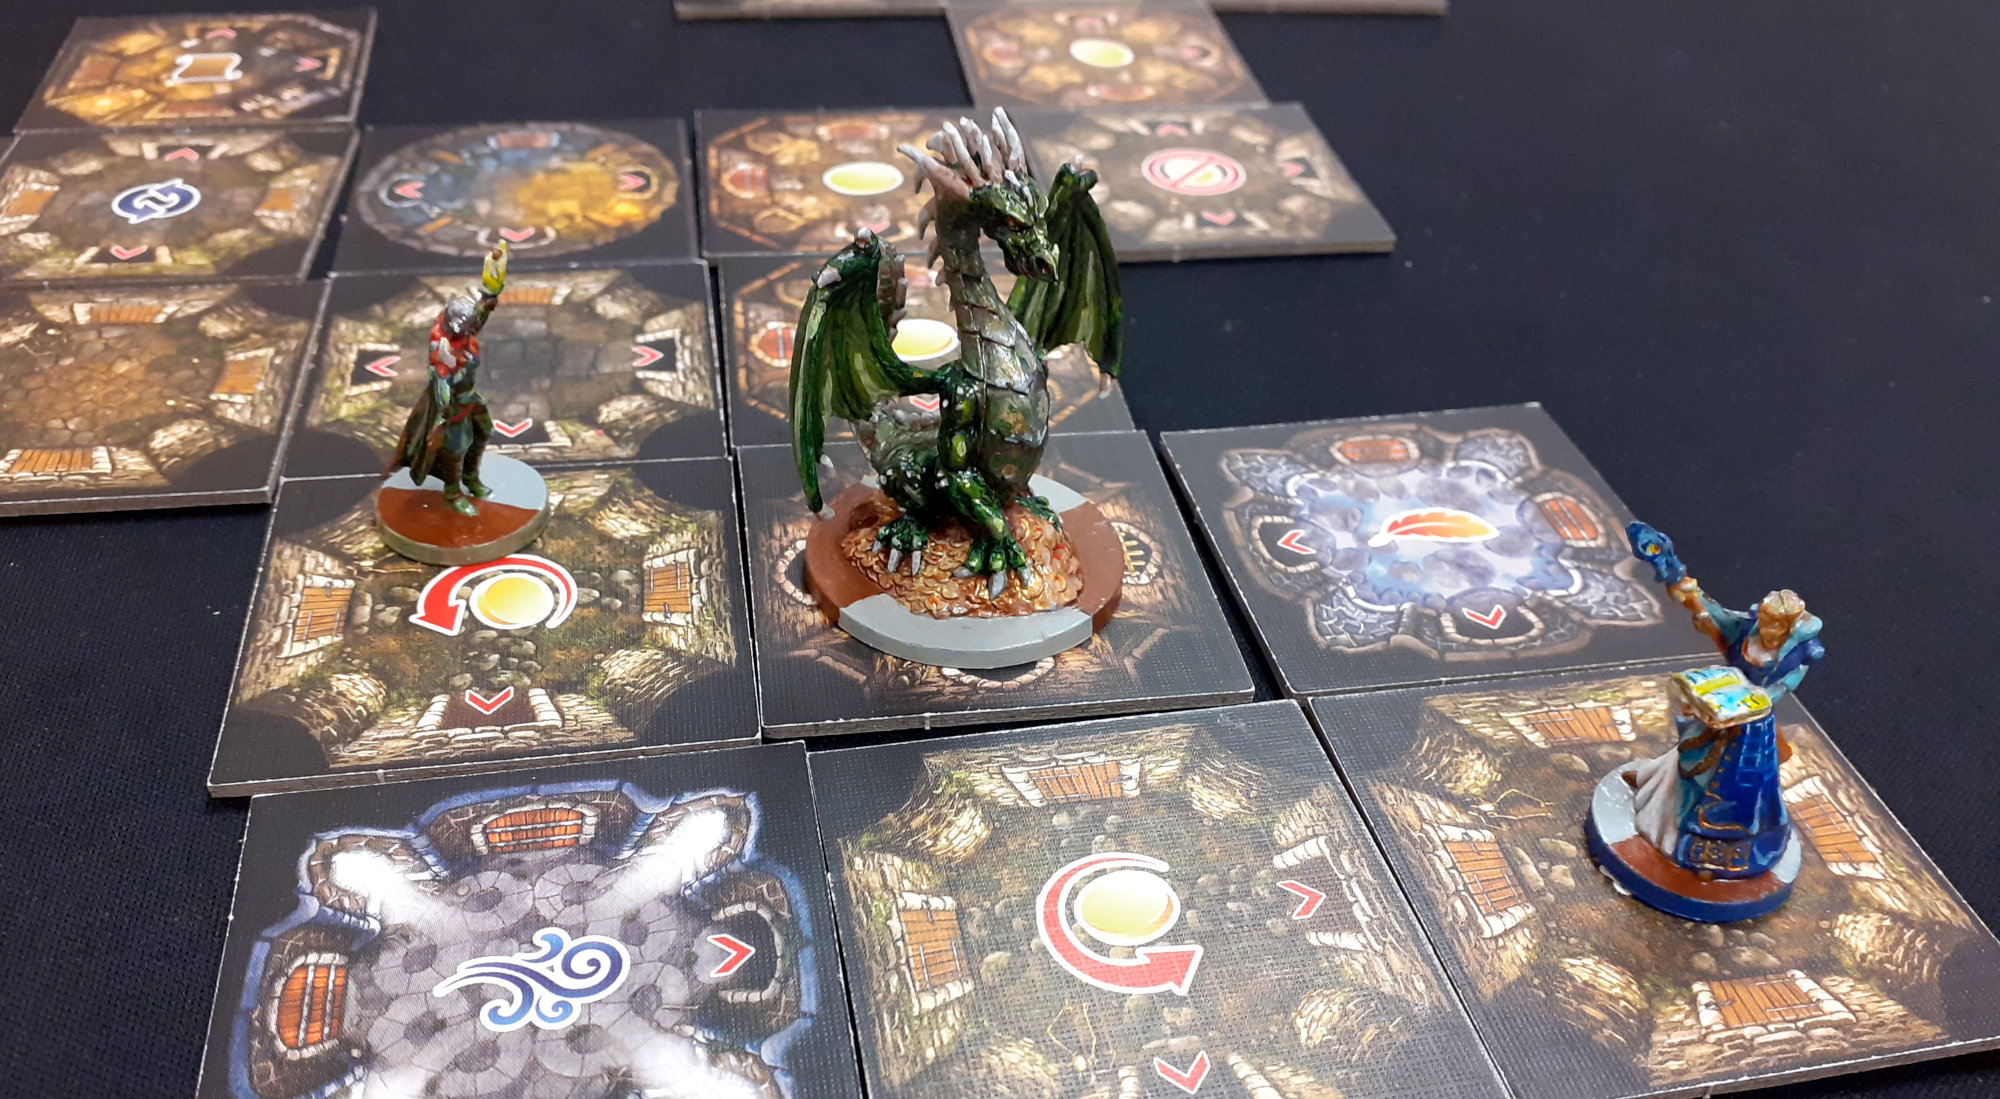 Juego de mesa Drakon - detalle de partida